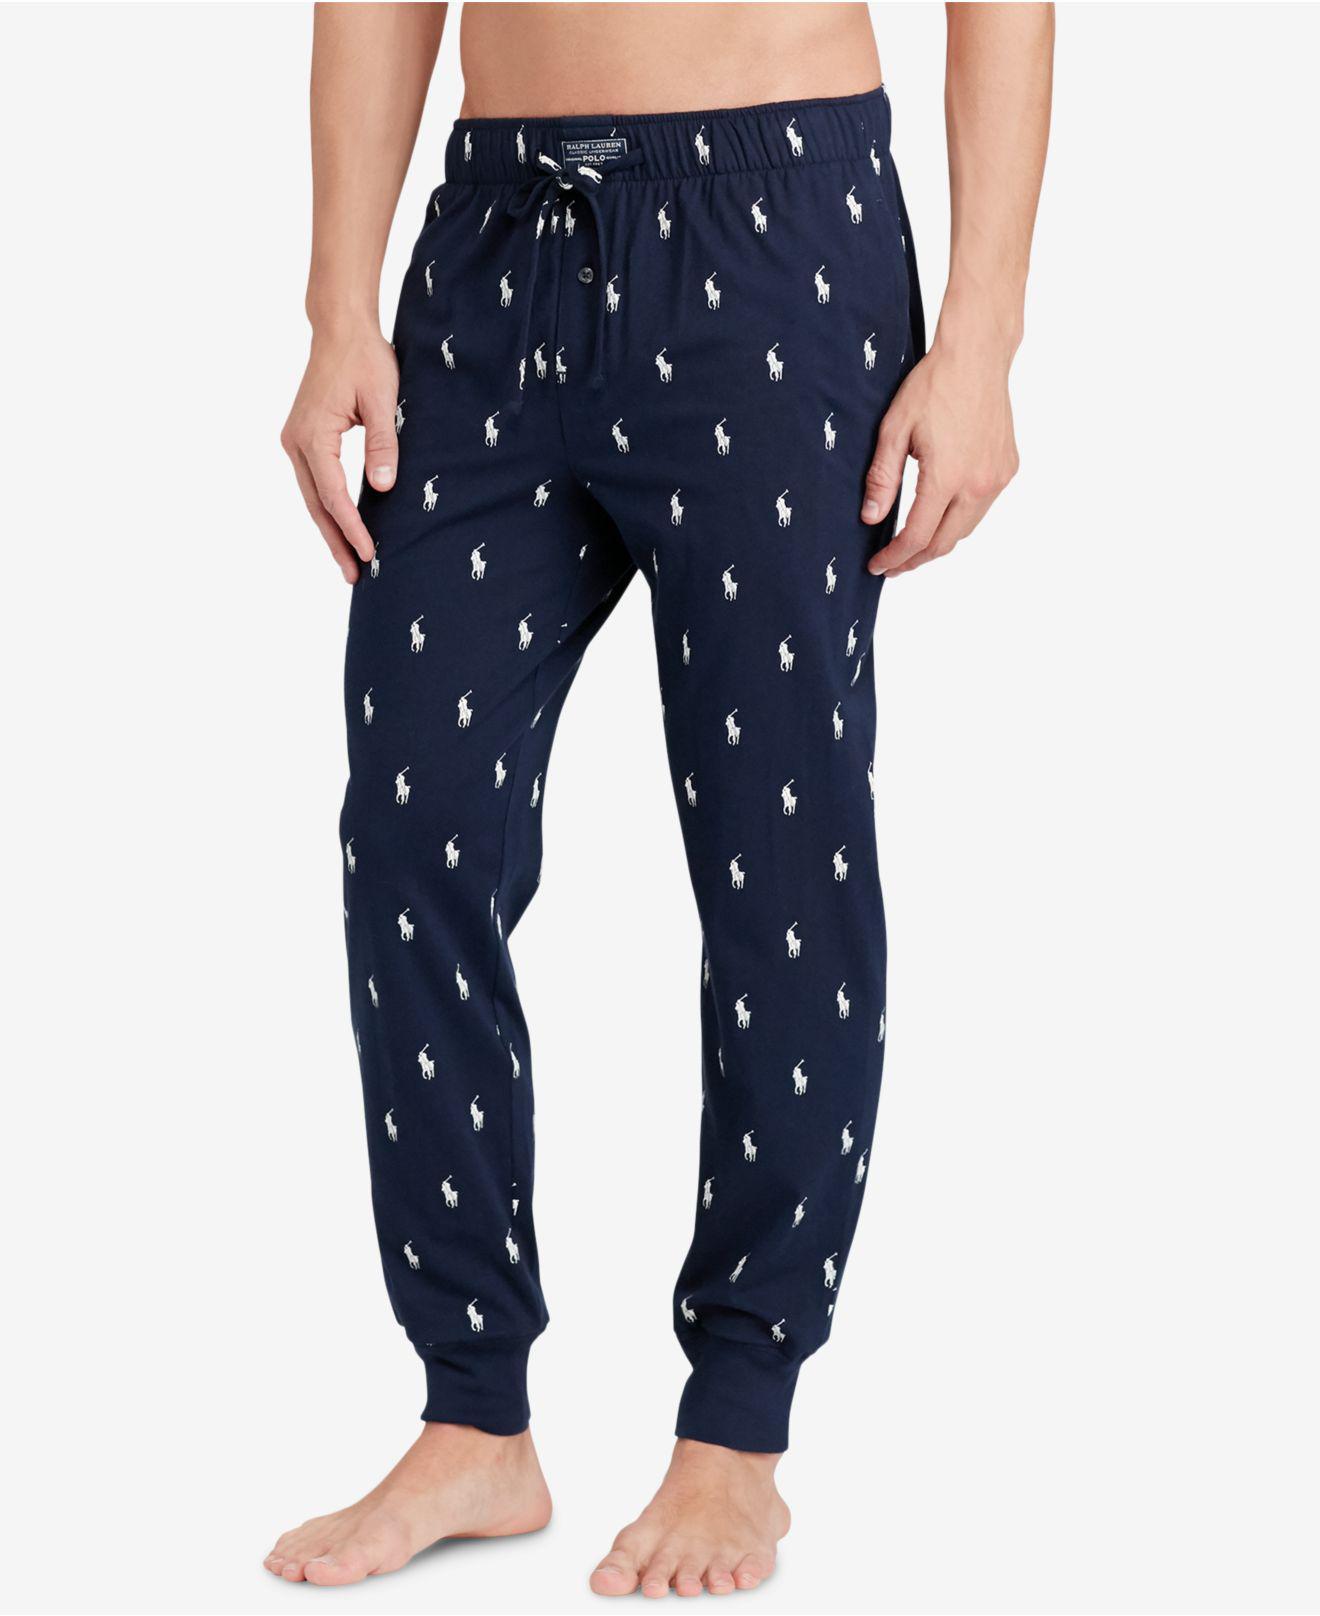 655ea51c93e9 Lyst - Polo Ralph Lauren Pony Print Jogger Pants in Blue for Men ...